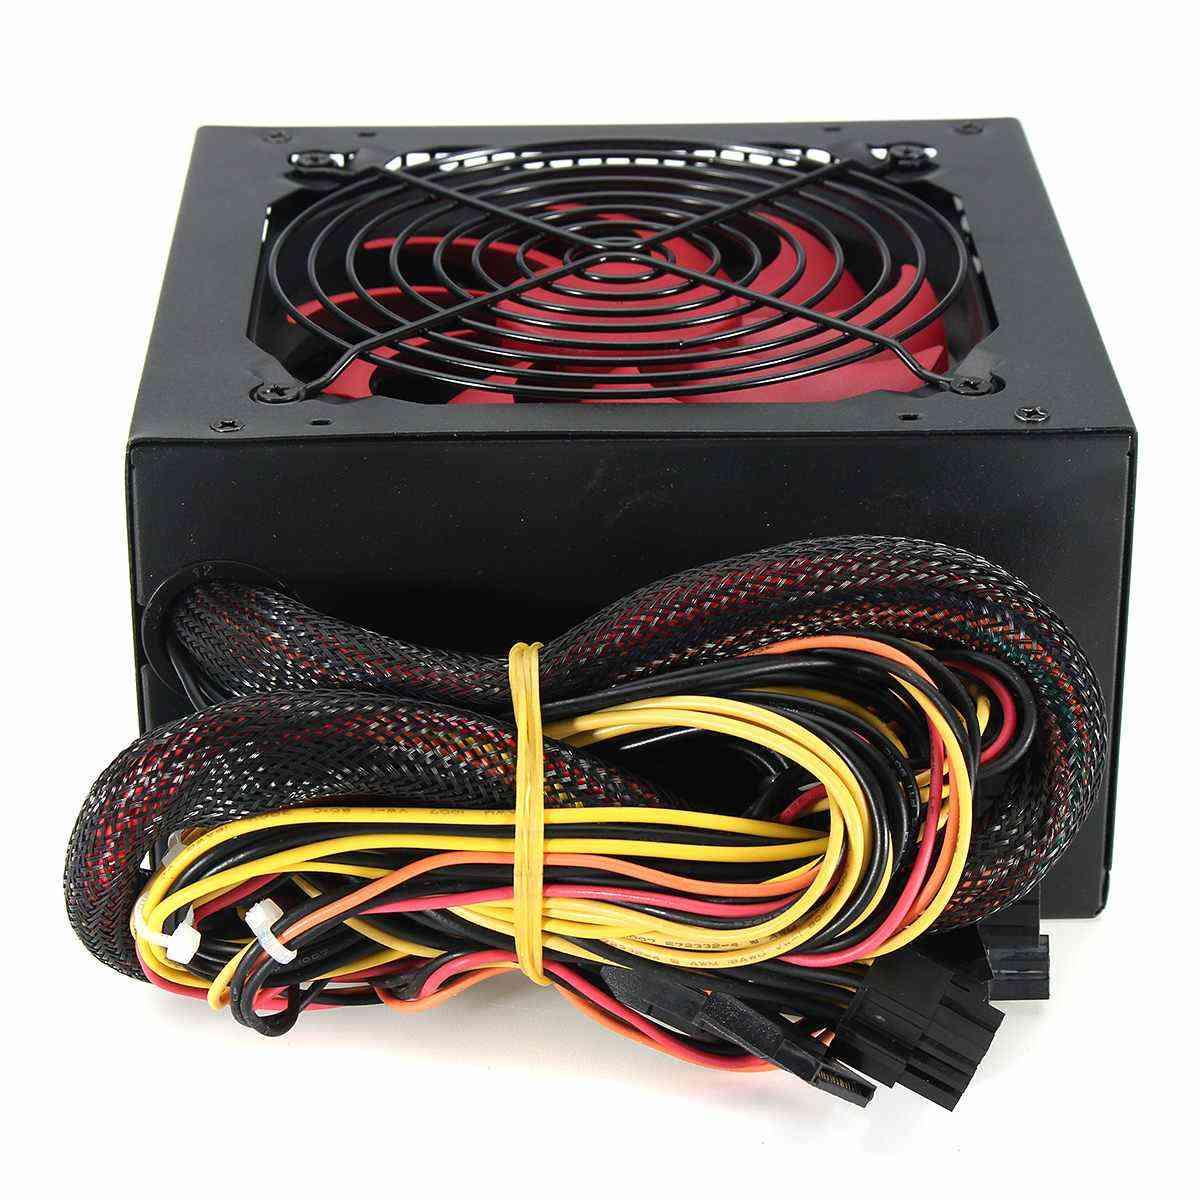 Multi-channel Pc Power Supply Fan For Intel Amd Pc 12v Atx Sli Pci-e Gaming